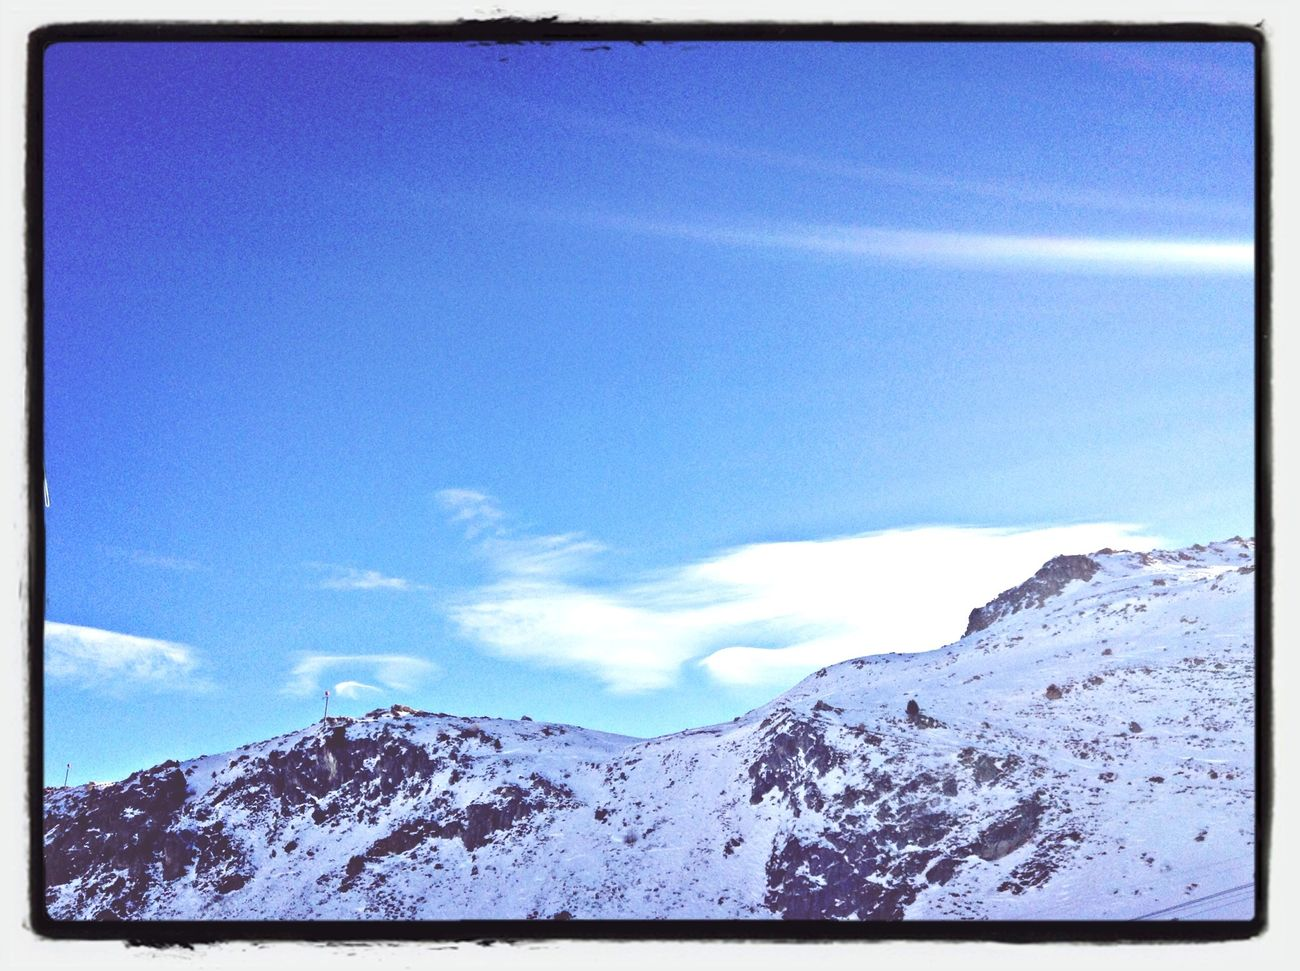 Wohin niemand in den Berge n sieht. Skyporn Bluesky Mountains